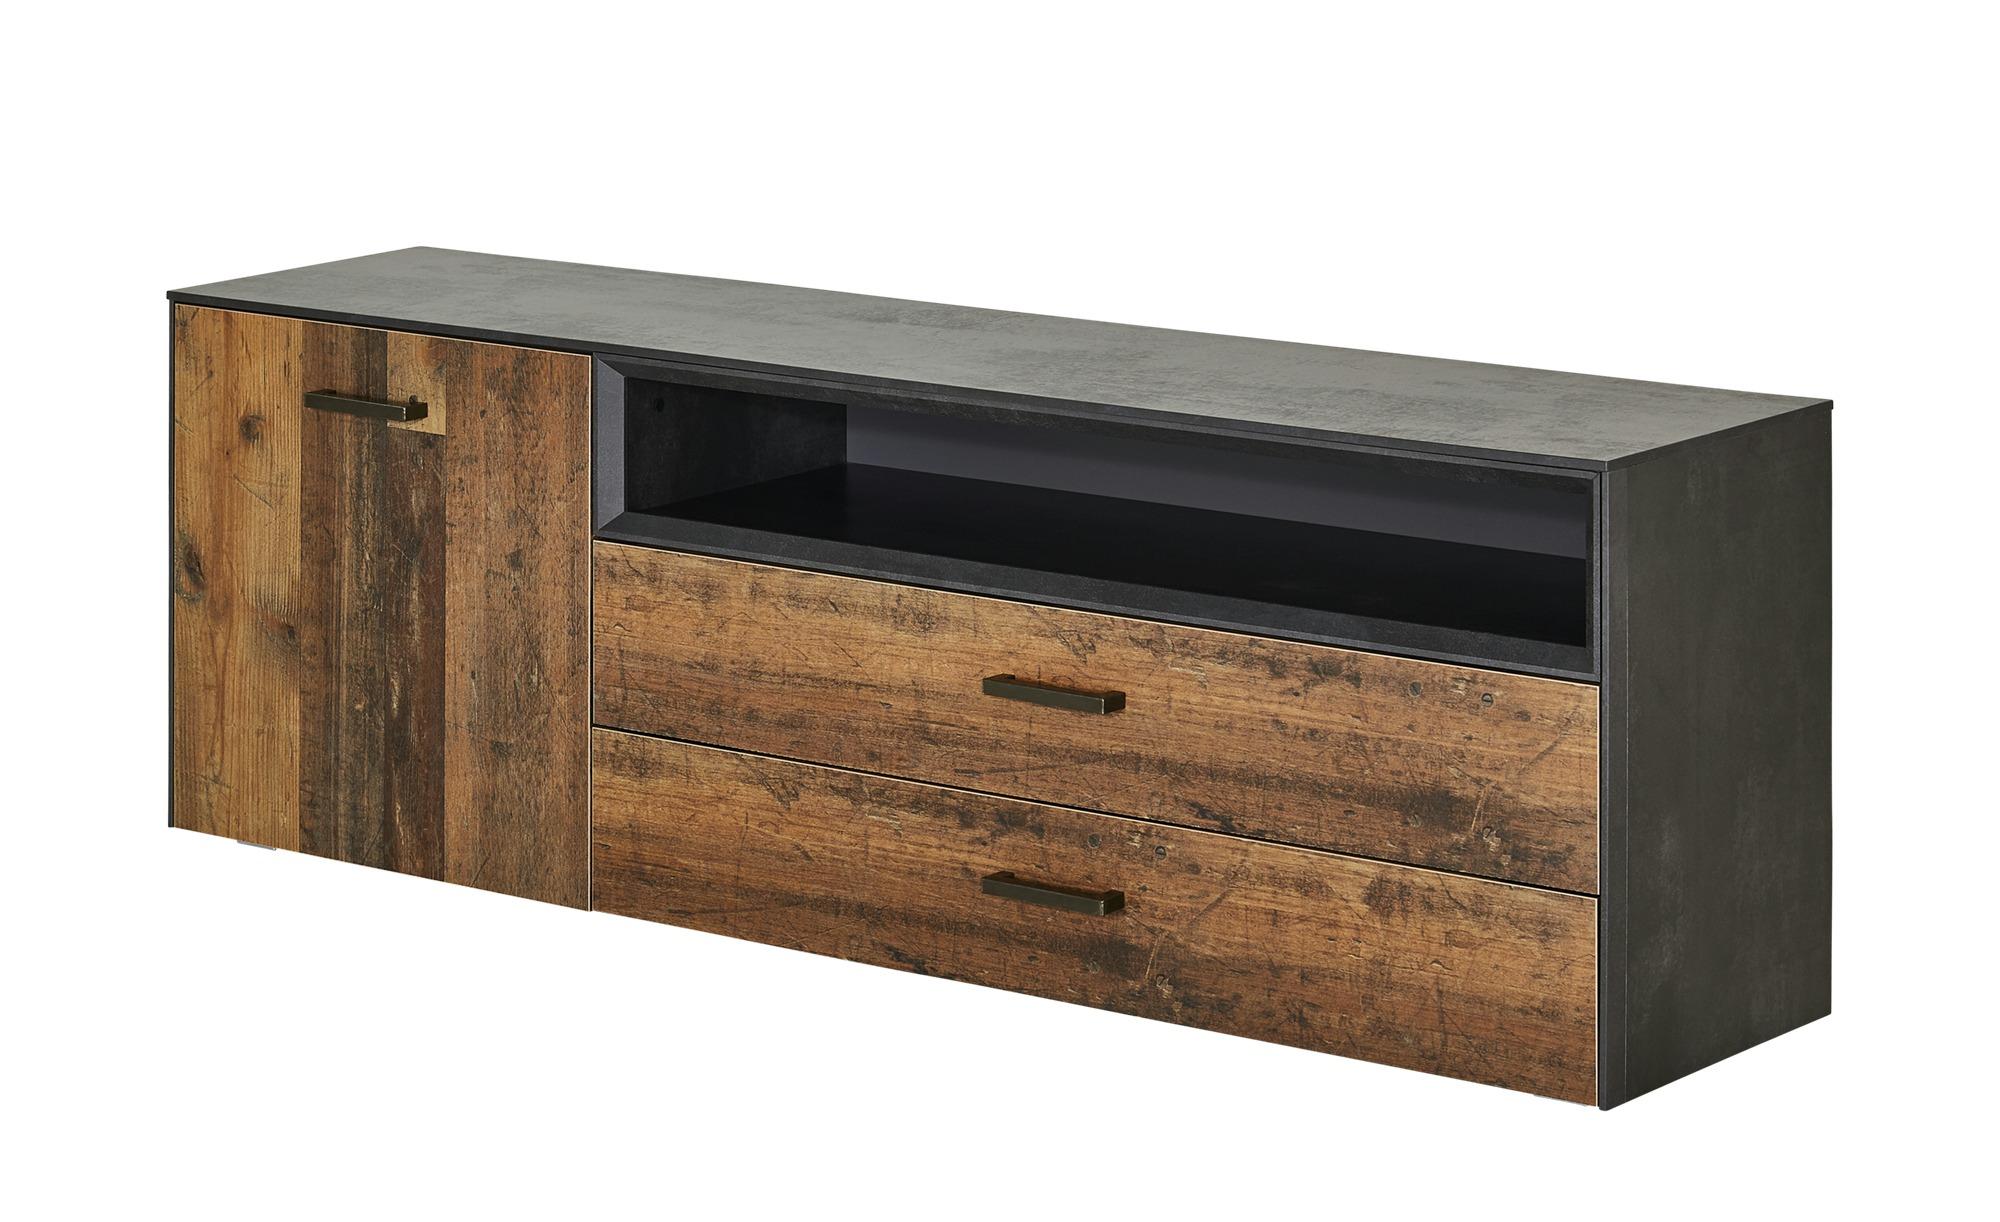 Lowboard  Matera ¦ holzfarben ¦ Maße (cm): B: 177 H: 60 T: 41 Kommoden & Sideboards > Lowboards - Höffner